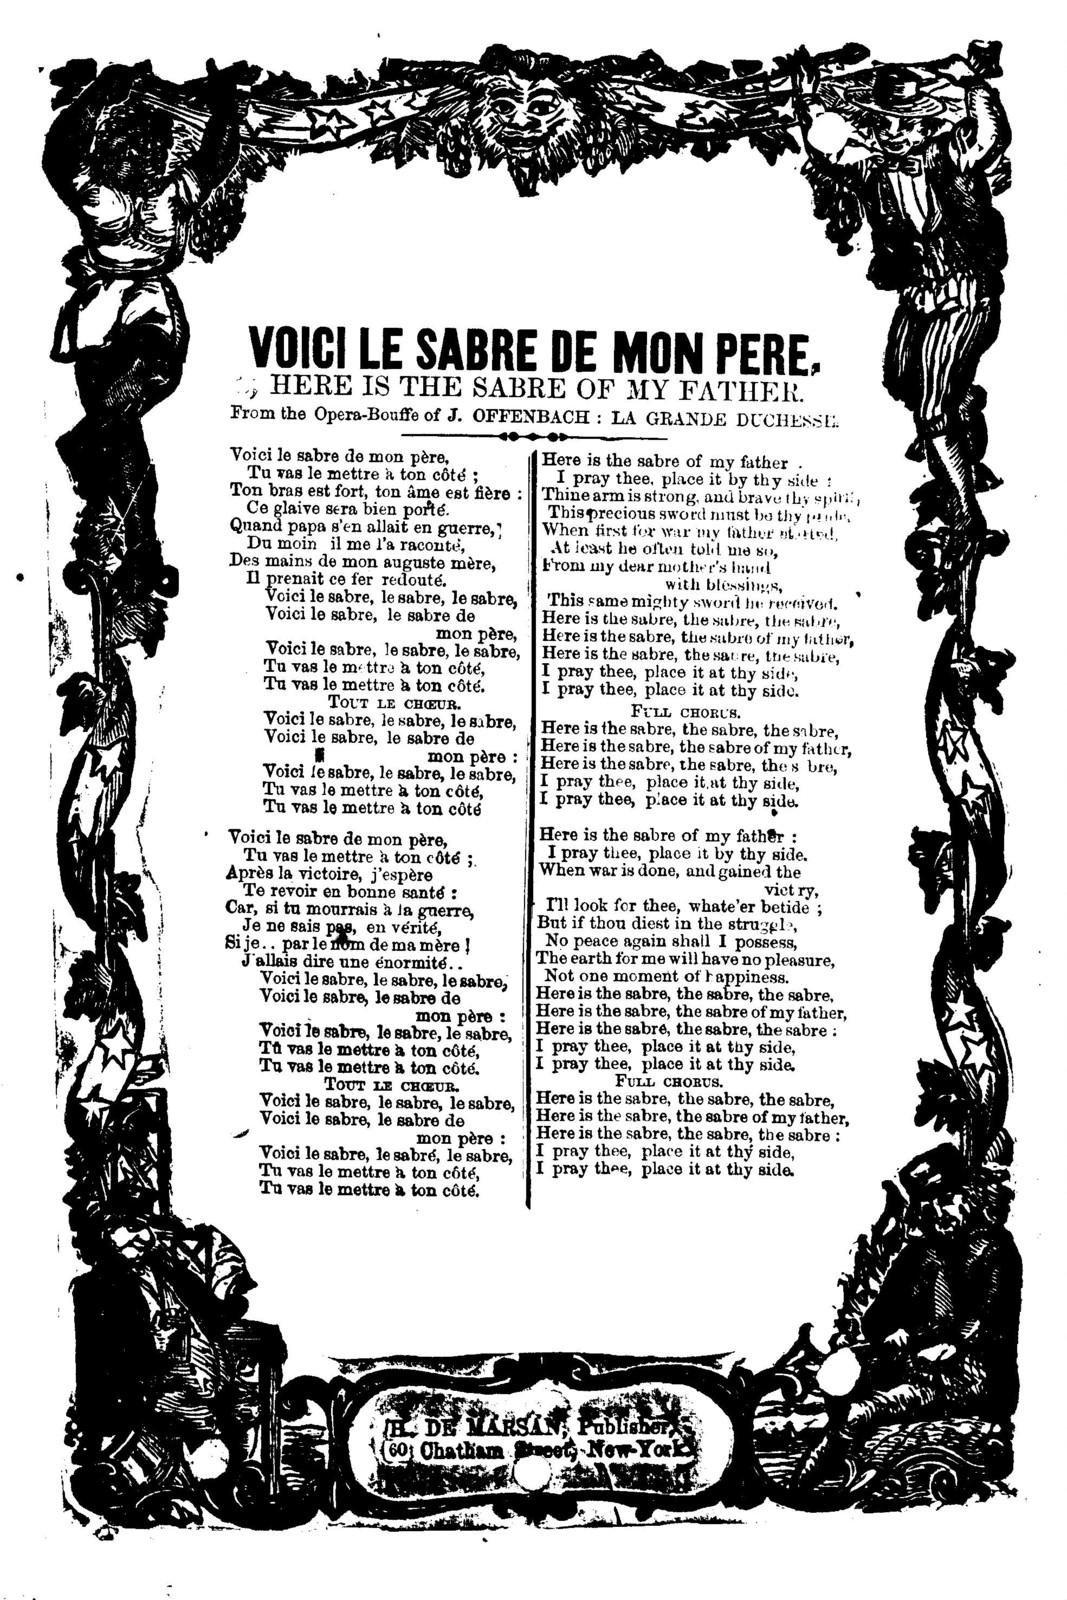 Voici le sebre de mon pere. Here is the sabre of my father. From the opera-bouffe of J. Offenbach: La Grande Duchesse. H. De Marsan, Publisher, 60 Chatham Street, New York